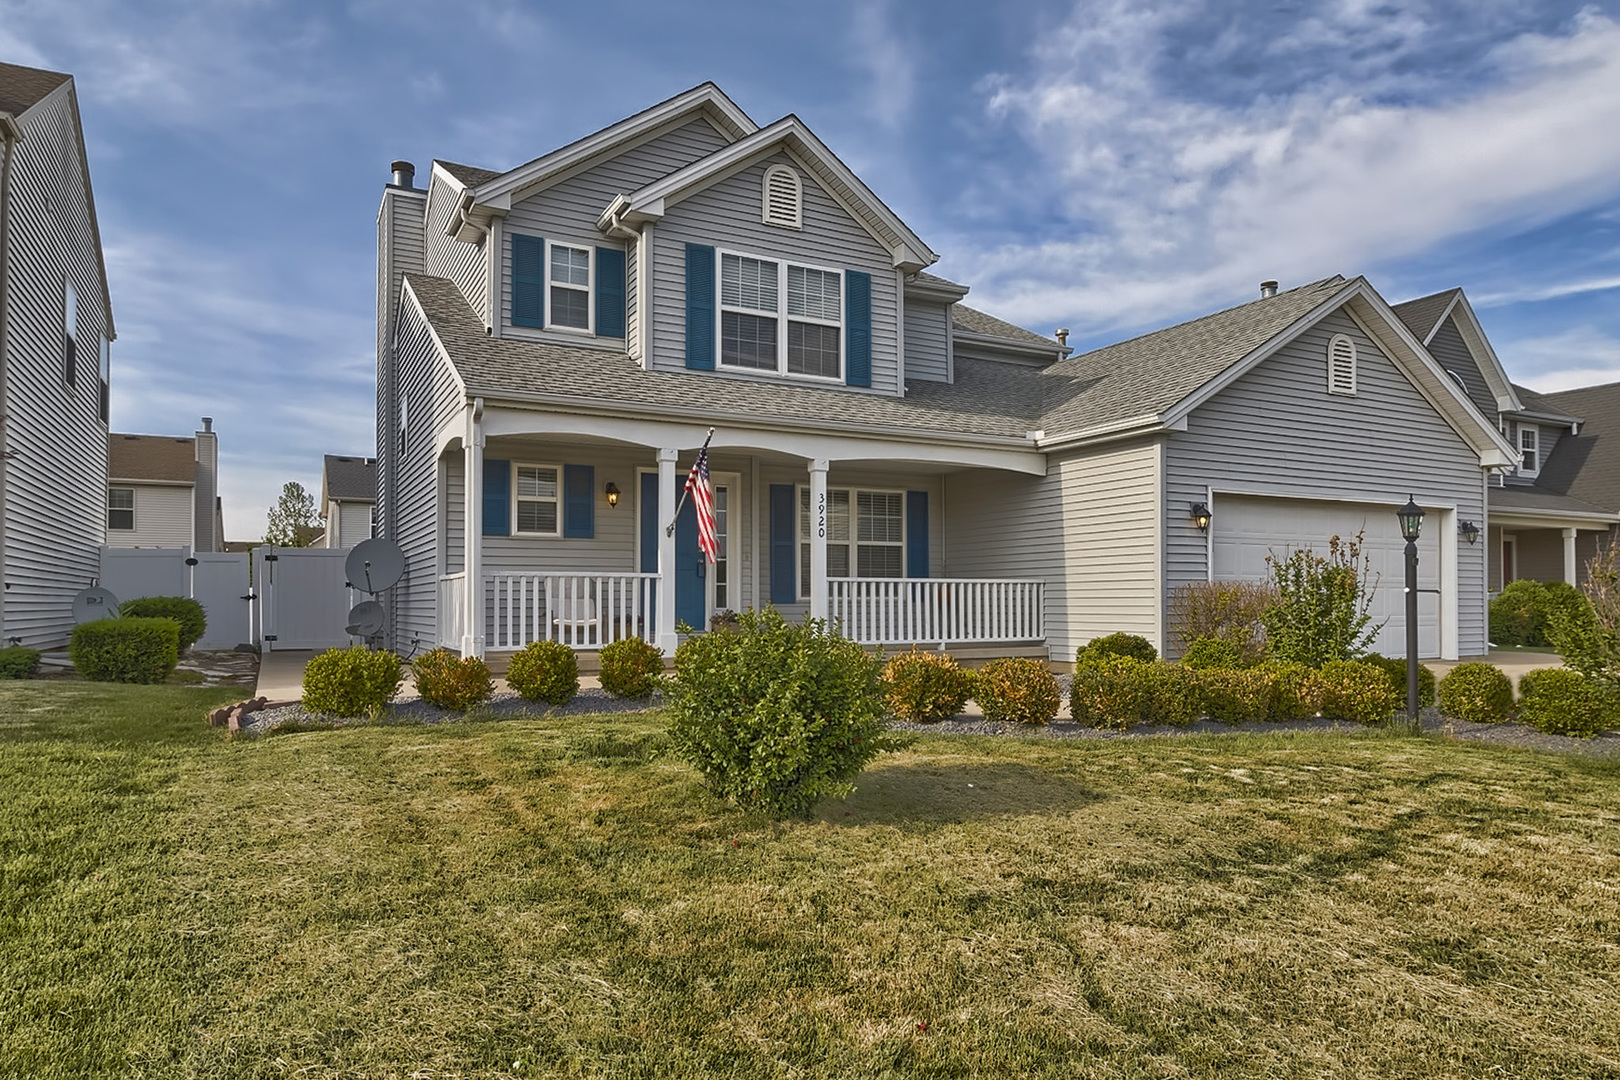 3920 Rockdale Drive, Champaign in Champaign County, IL 61822 Home for Sale